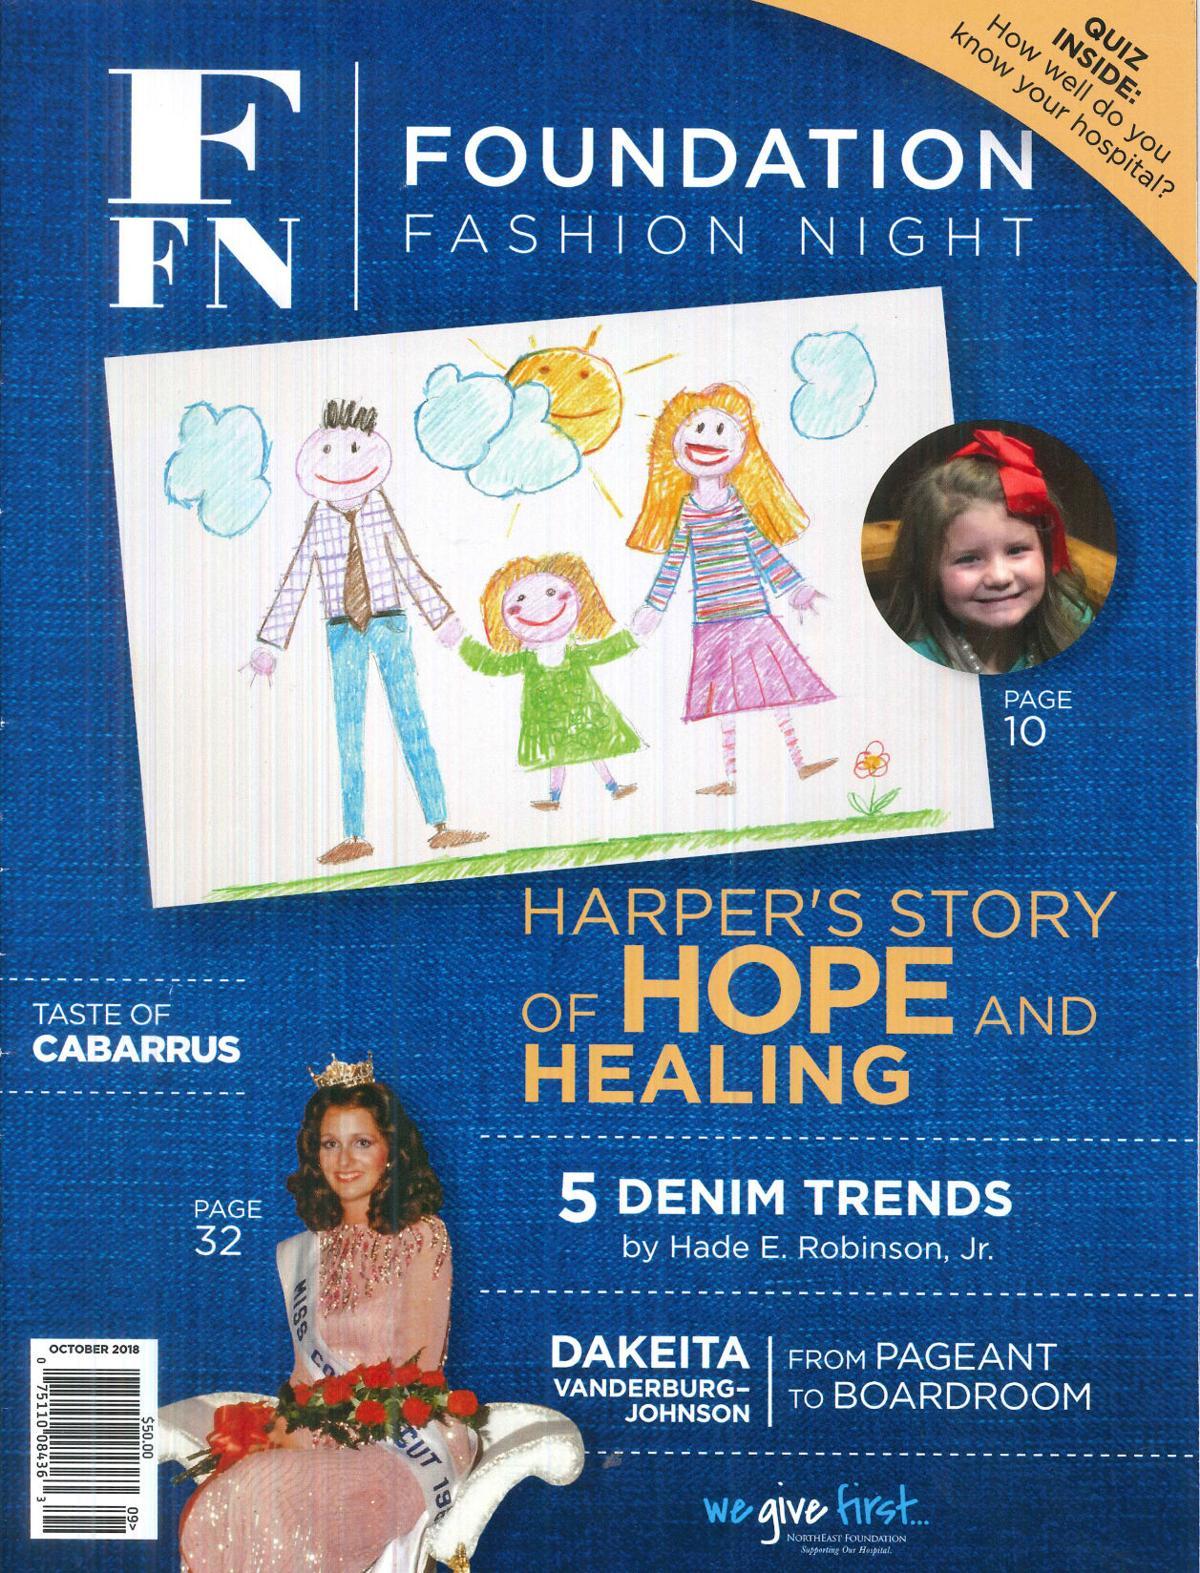 NorthEast Foundation Fashion Night